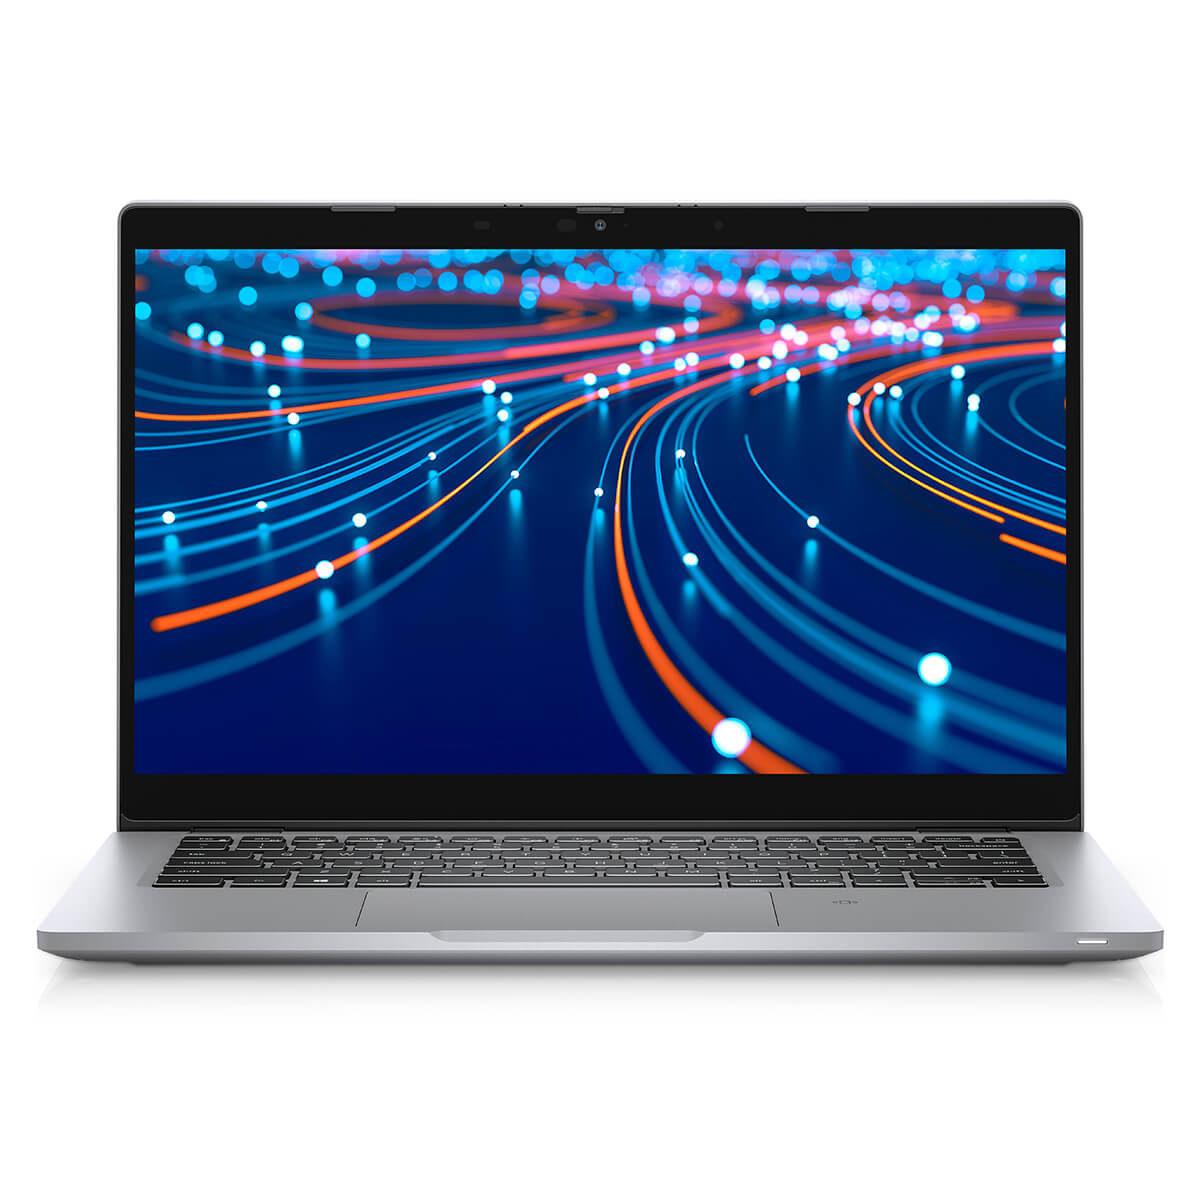 DELL Latitude 5320 (2021) - Hưng Phát Laptop